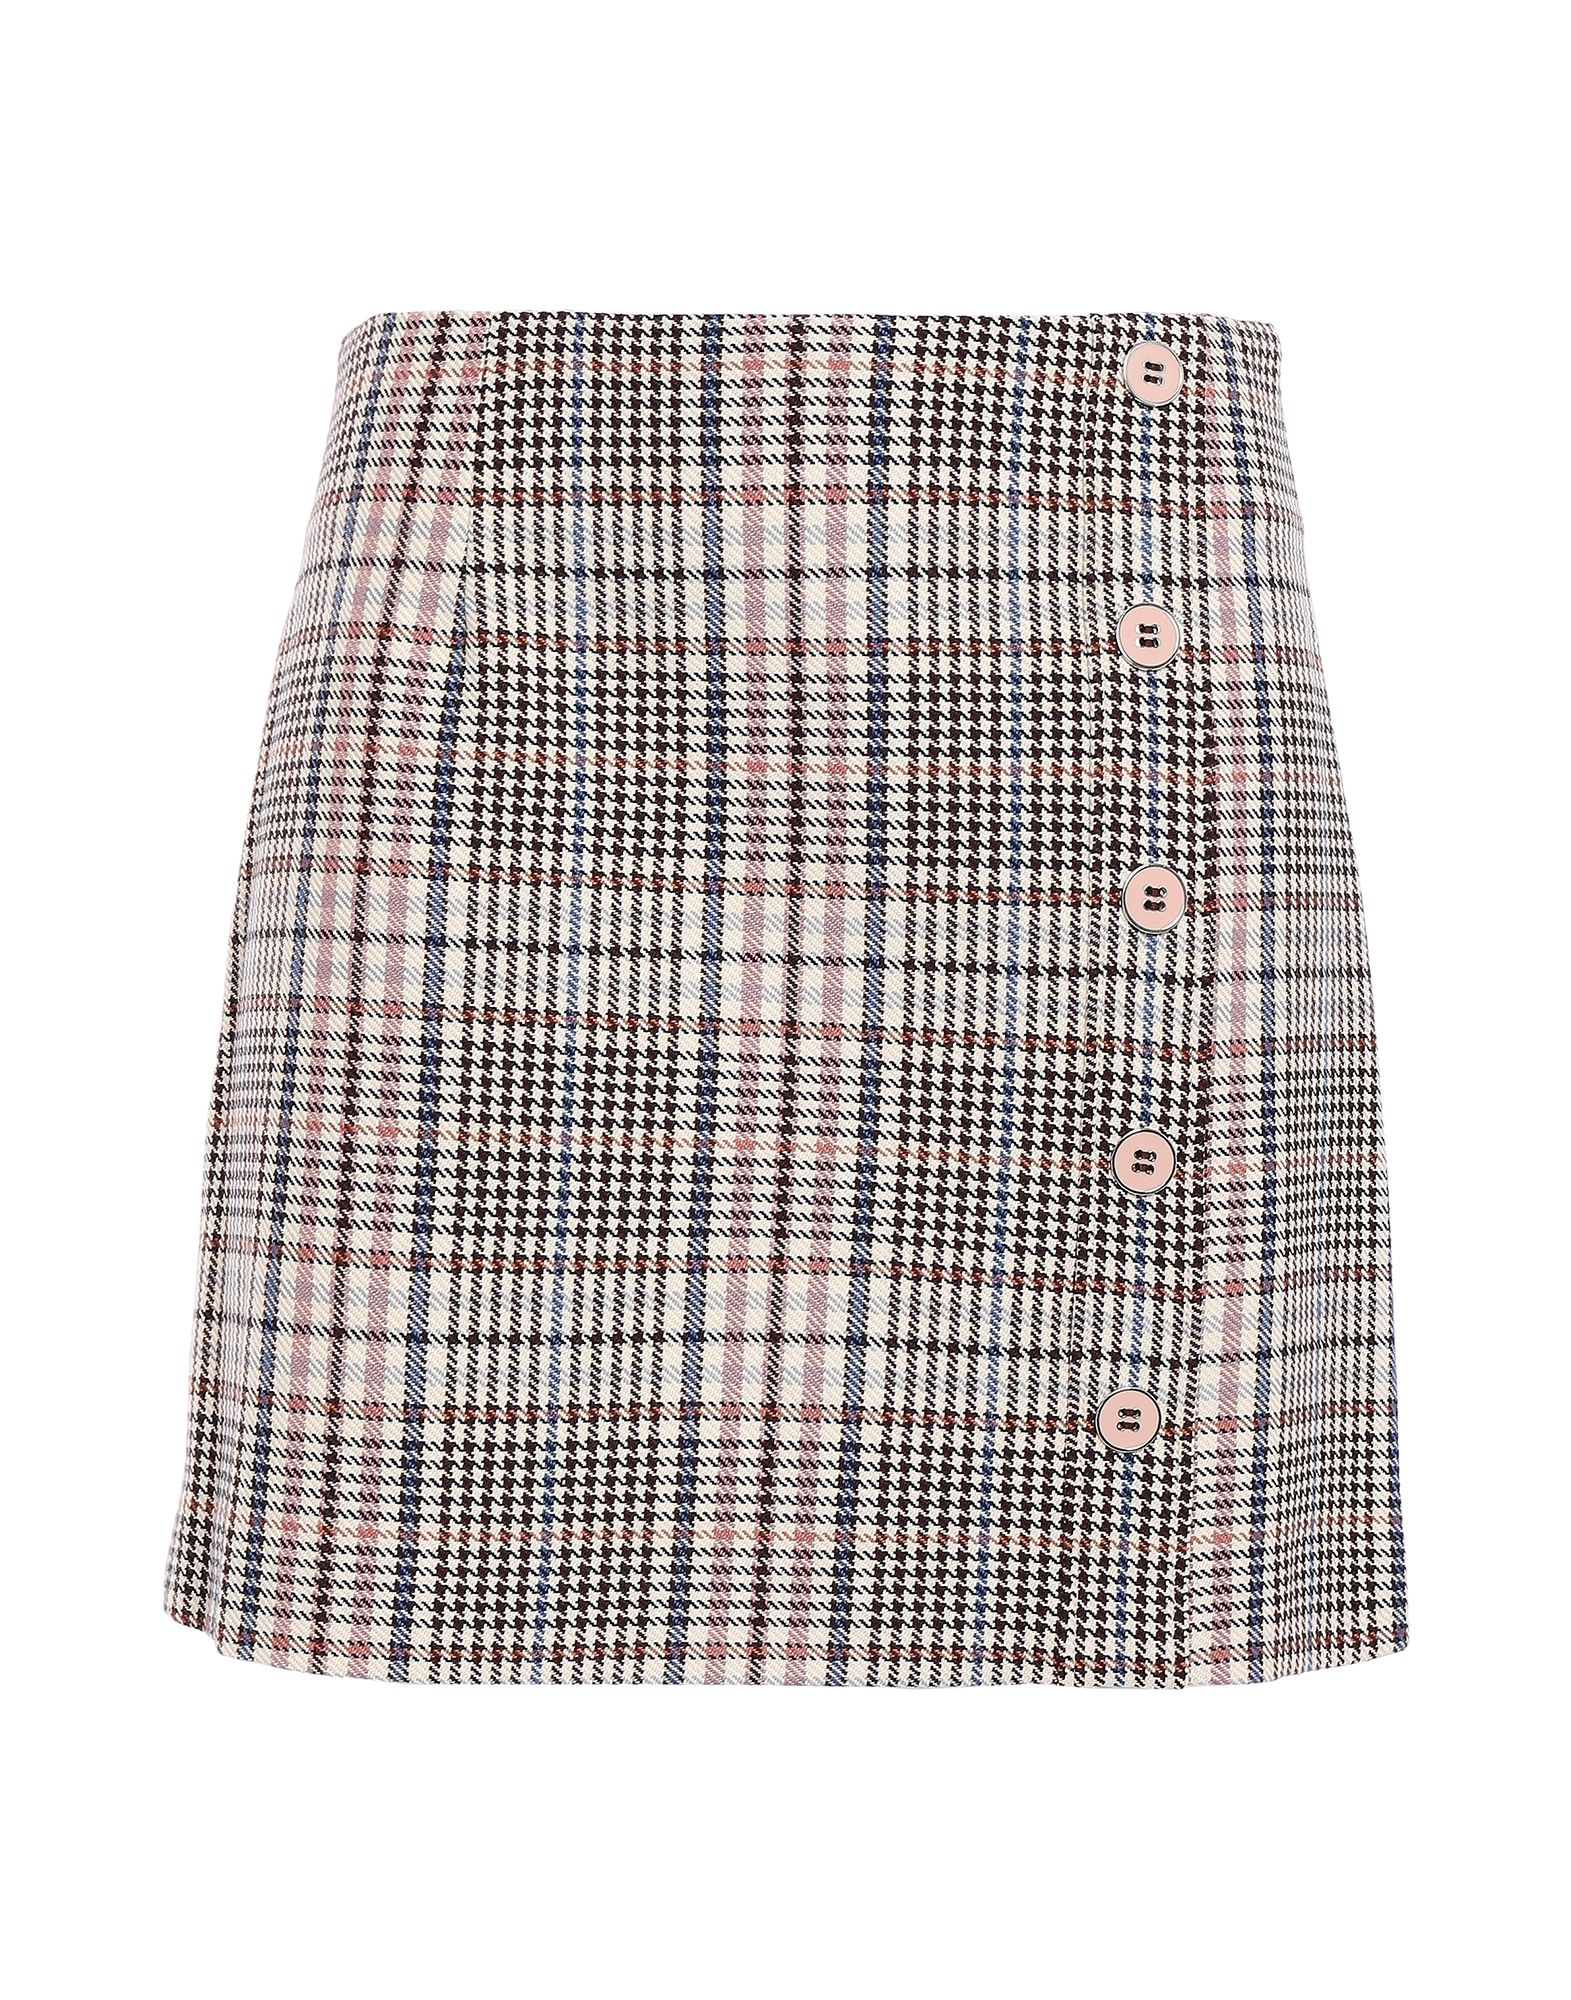 VERONICA BEARD Mini skirts. plain weave, contrasting applications, glen plaid, rear closure, zipper closure, unlined, stretch. 98% Cotton, 2% Elastane